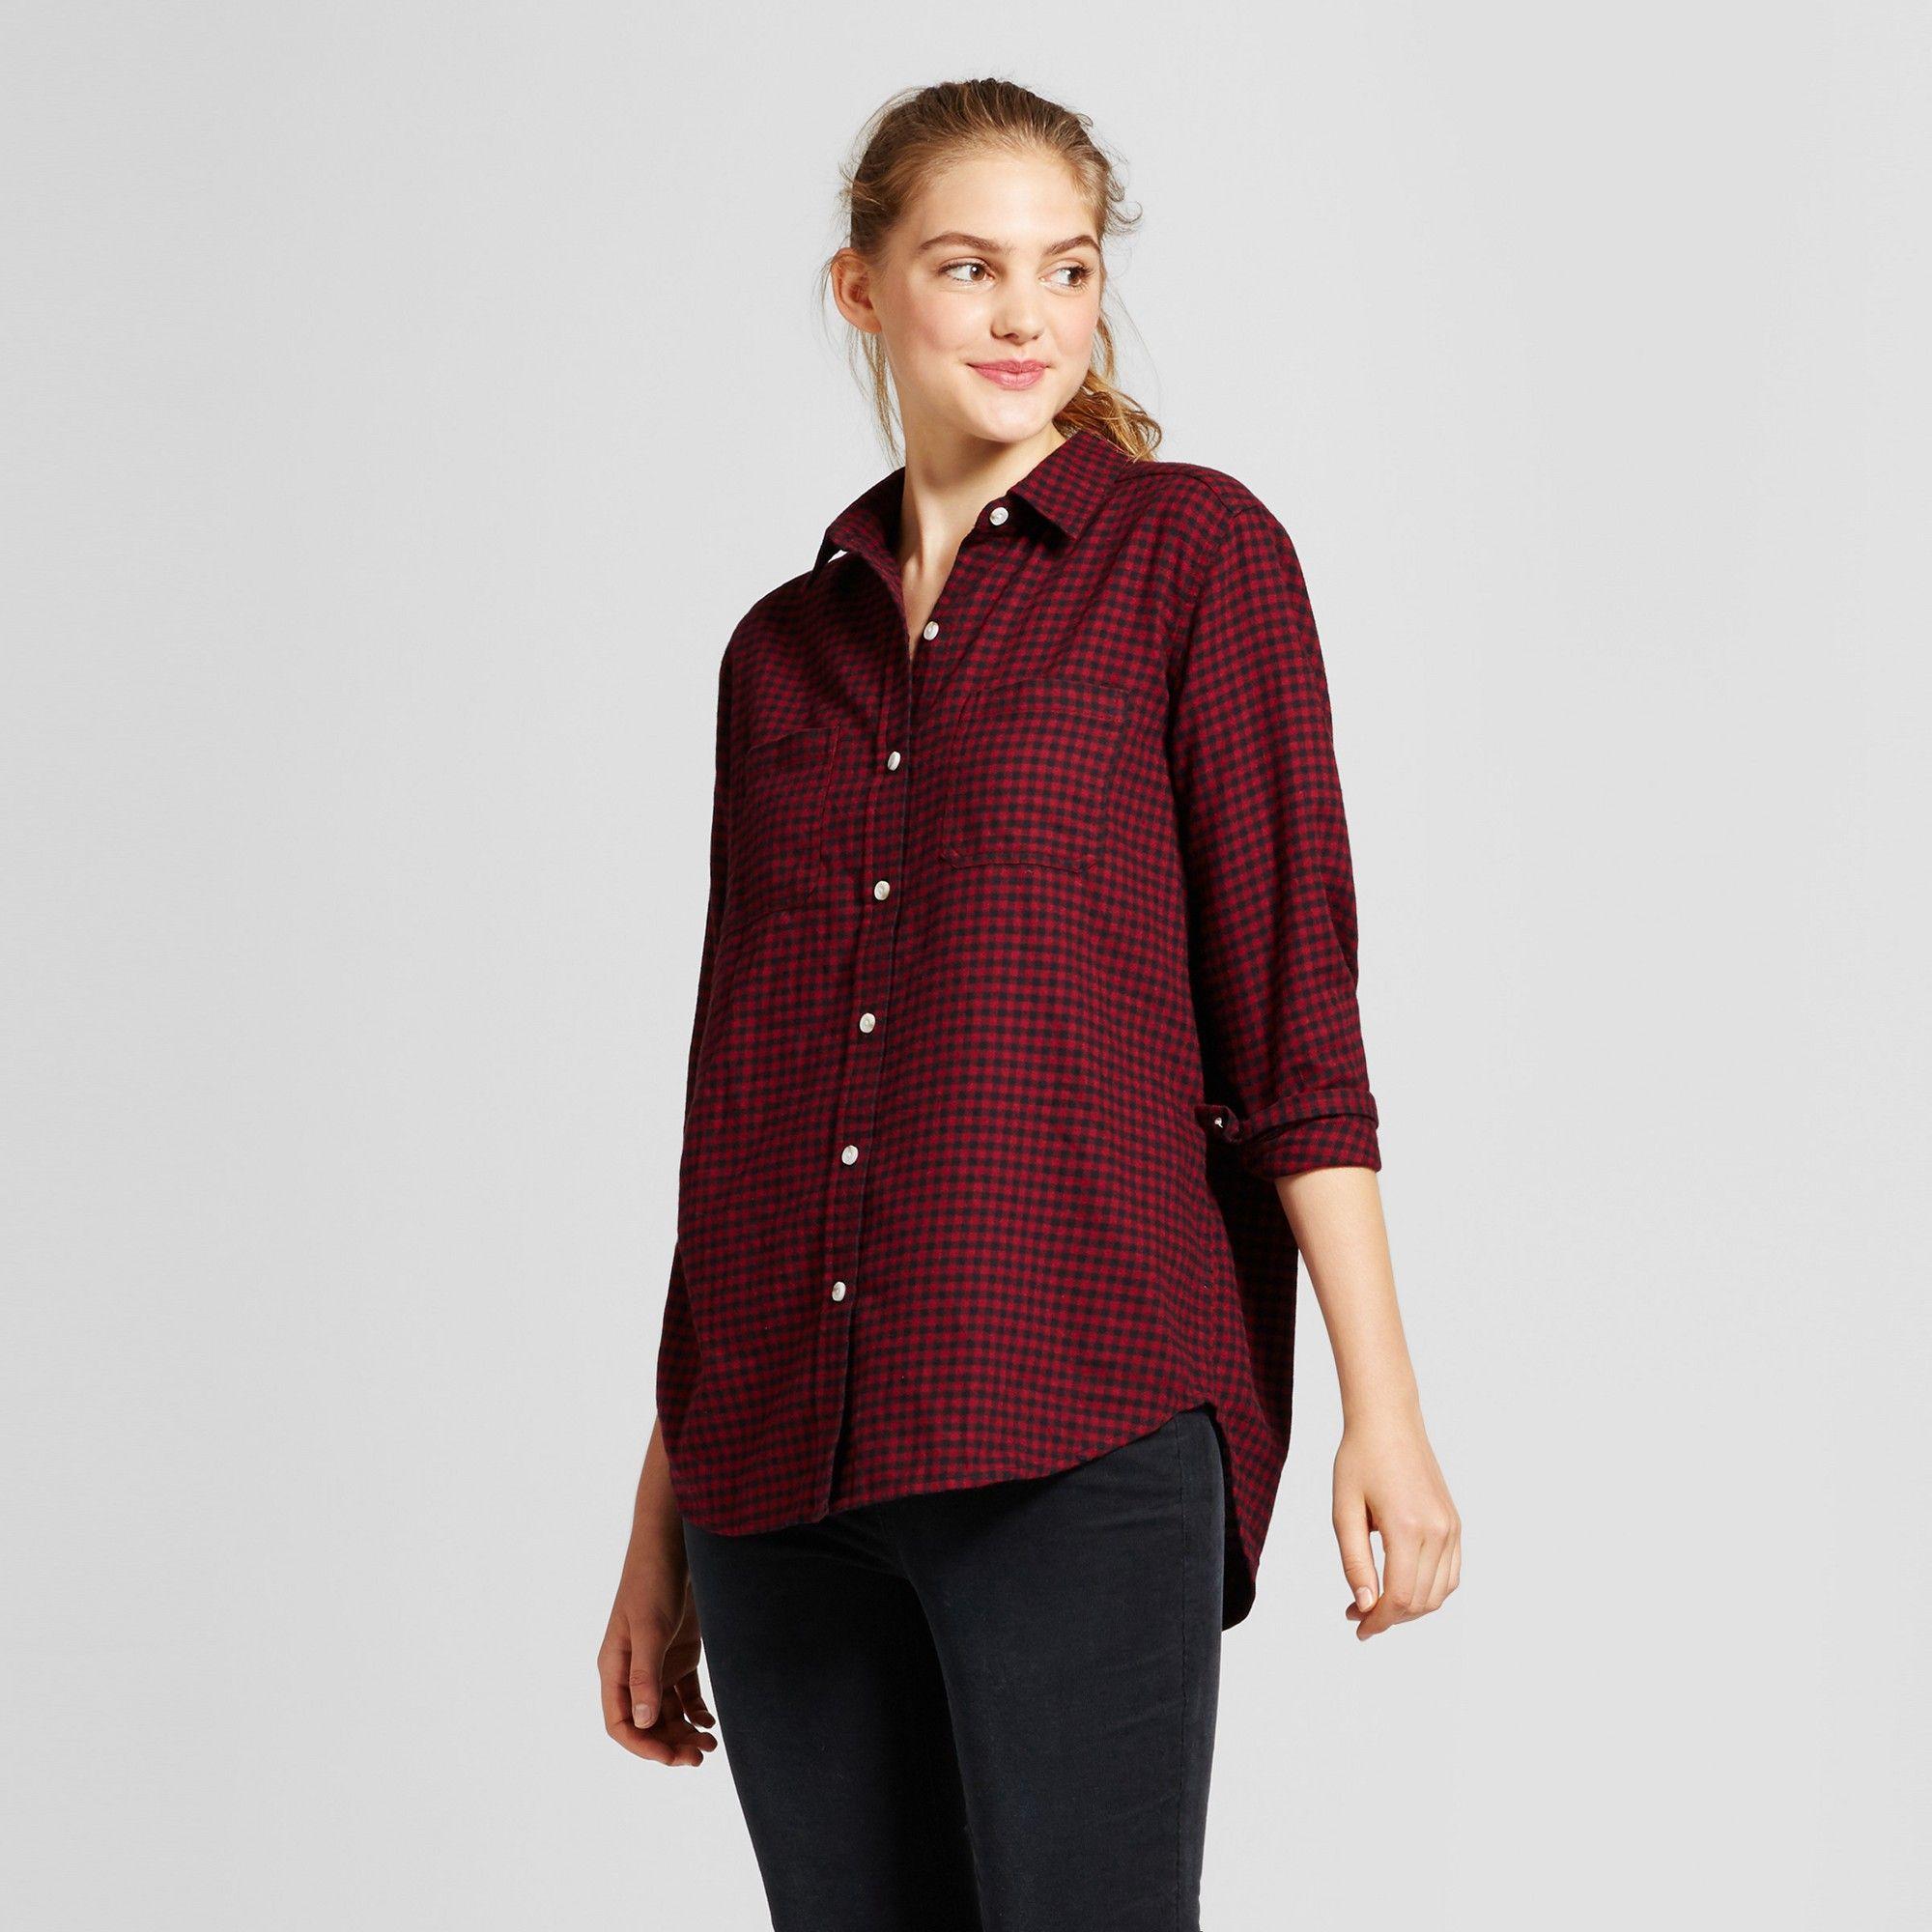 abd46628 Red Plaid Shirt Target | Top Mode Depot